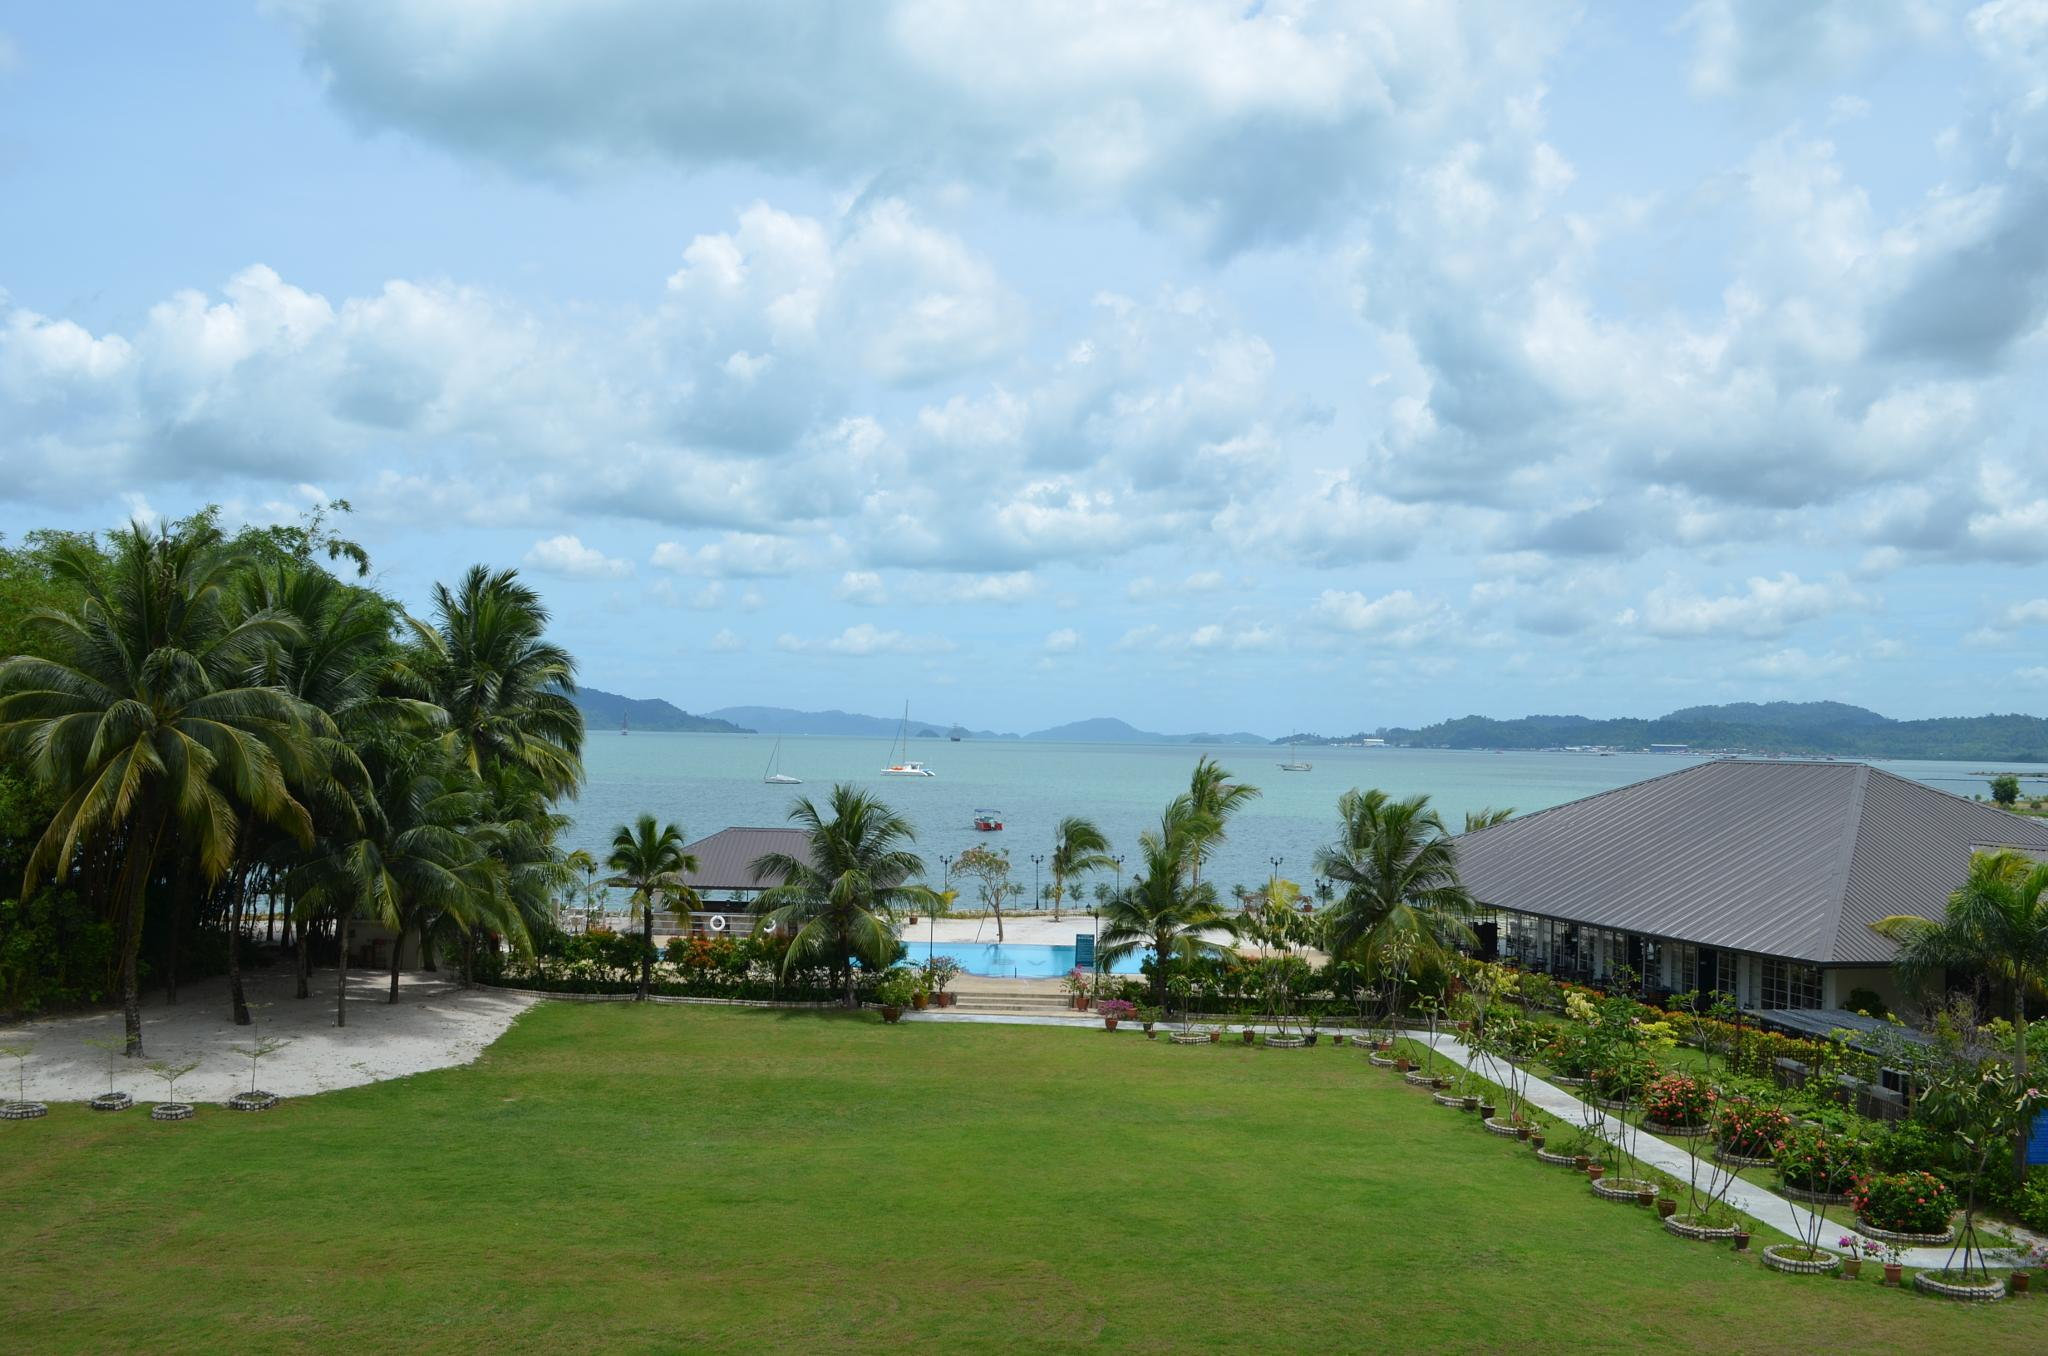 View from Beach Resort by Jayachandran Palanisamy